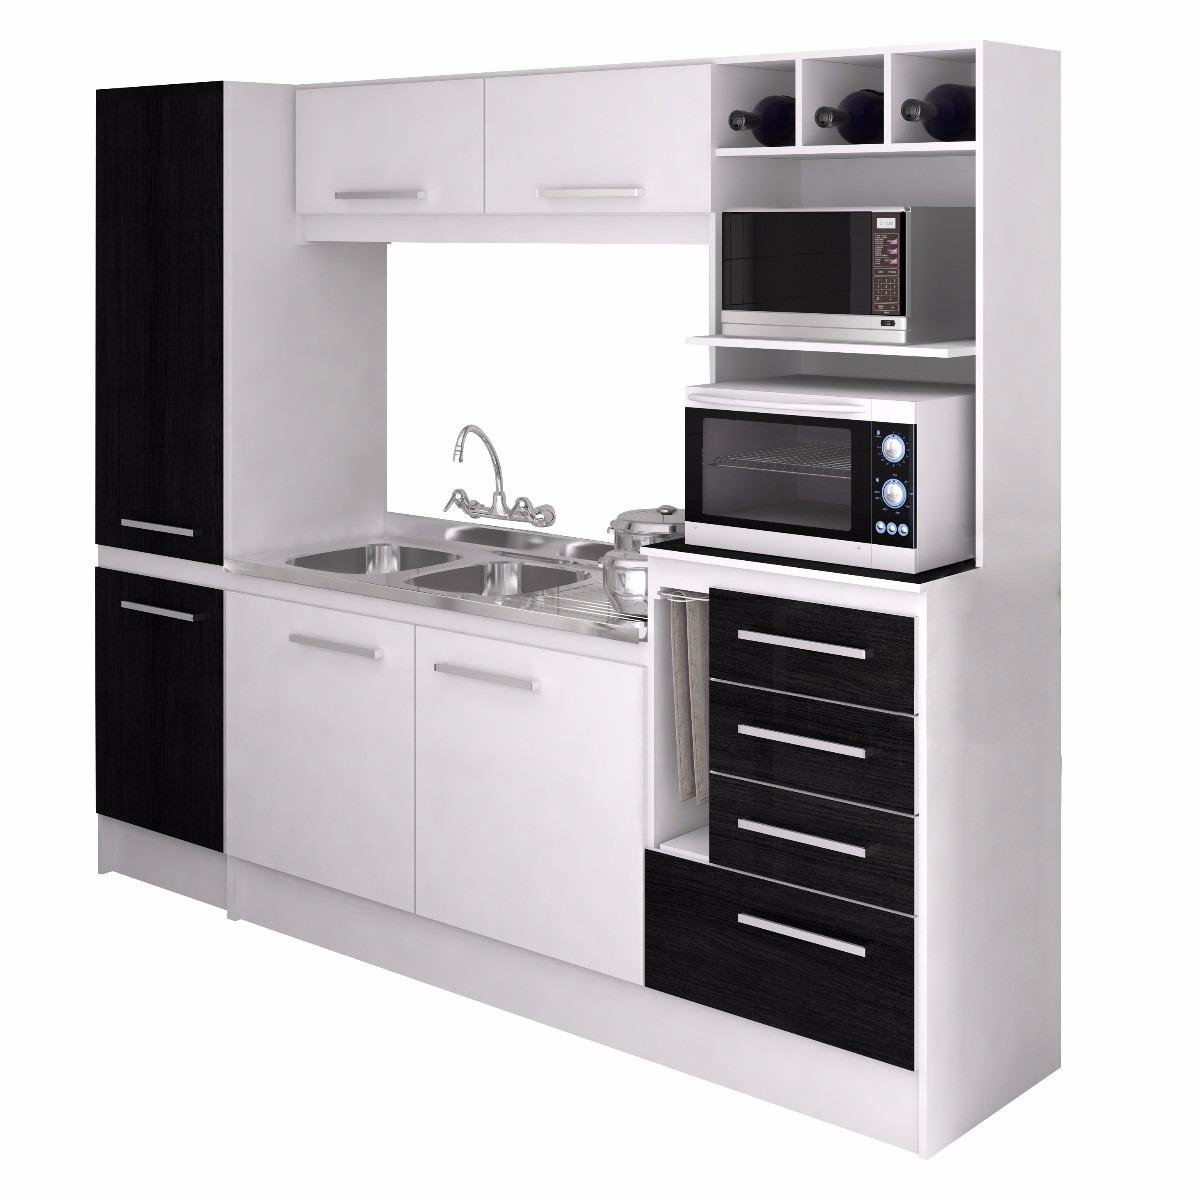 Mueble Cocina Kit | Mueble De Cocina Auxiliar Free Full Size Of Mueble